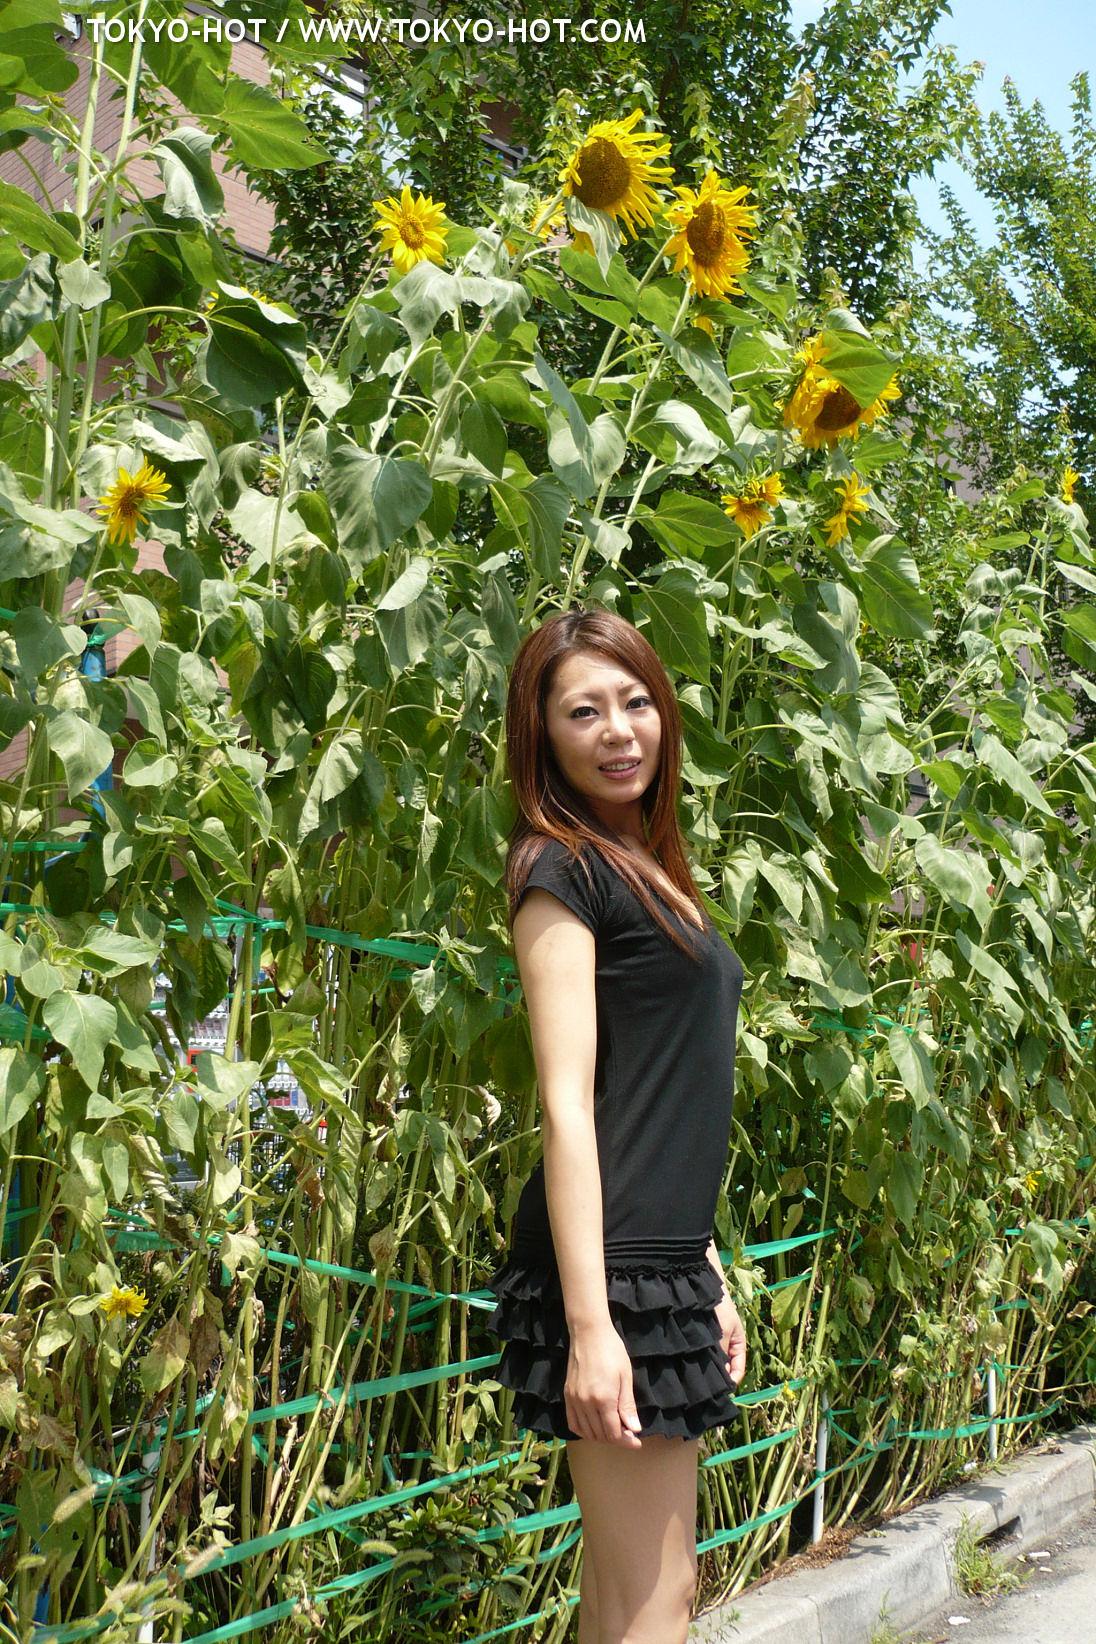 [Tokyo Hot] k0130 Kaori Takeda-竹田かおり - 貼圖 - 性感激情 -